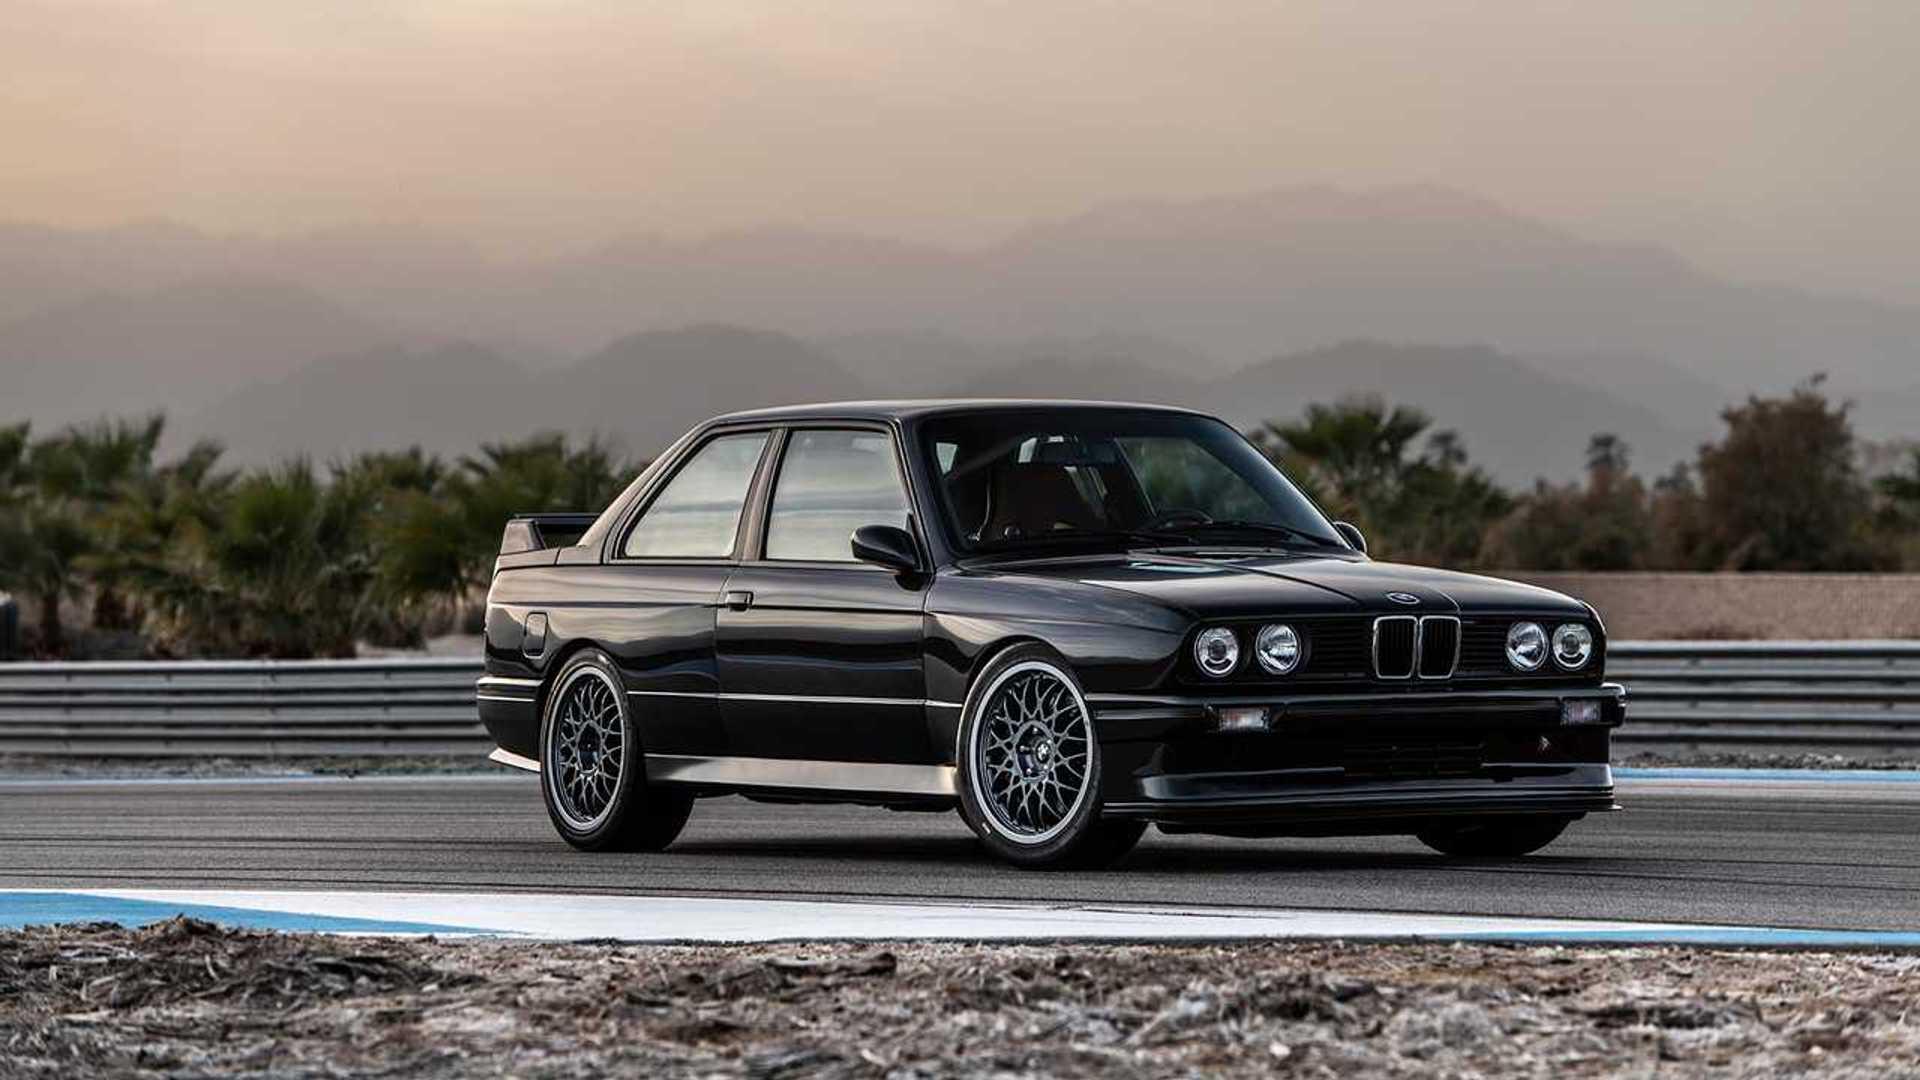 BMW E30 M3 >> Bmw E30 M3 Restomod Packs 390 Hp With Classic Looks